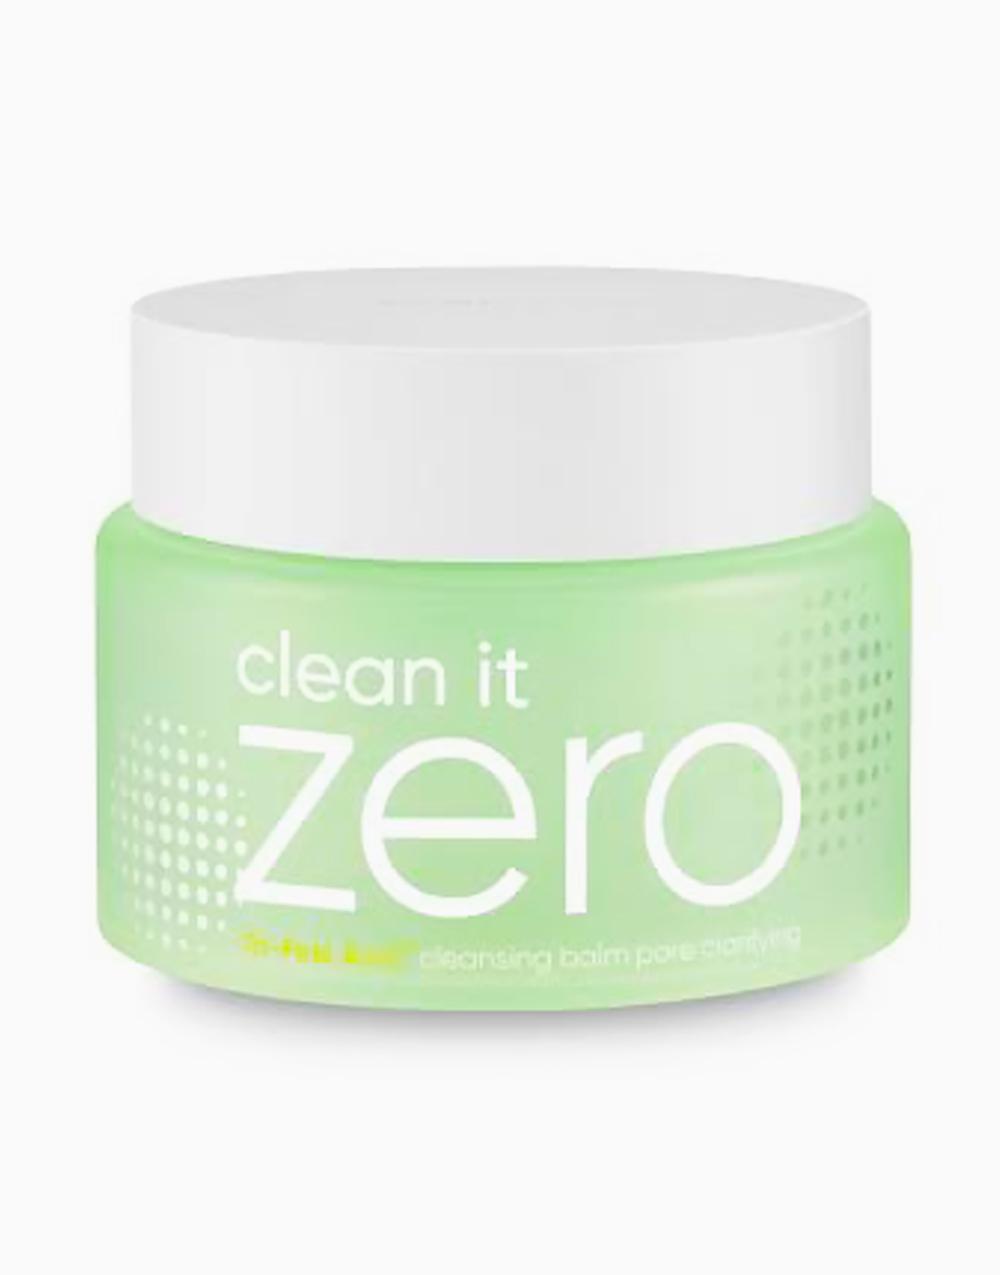 Clean It Zero Pore Clarifying Balm by Banila Co.